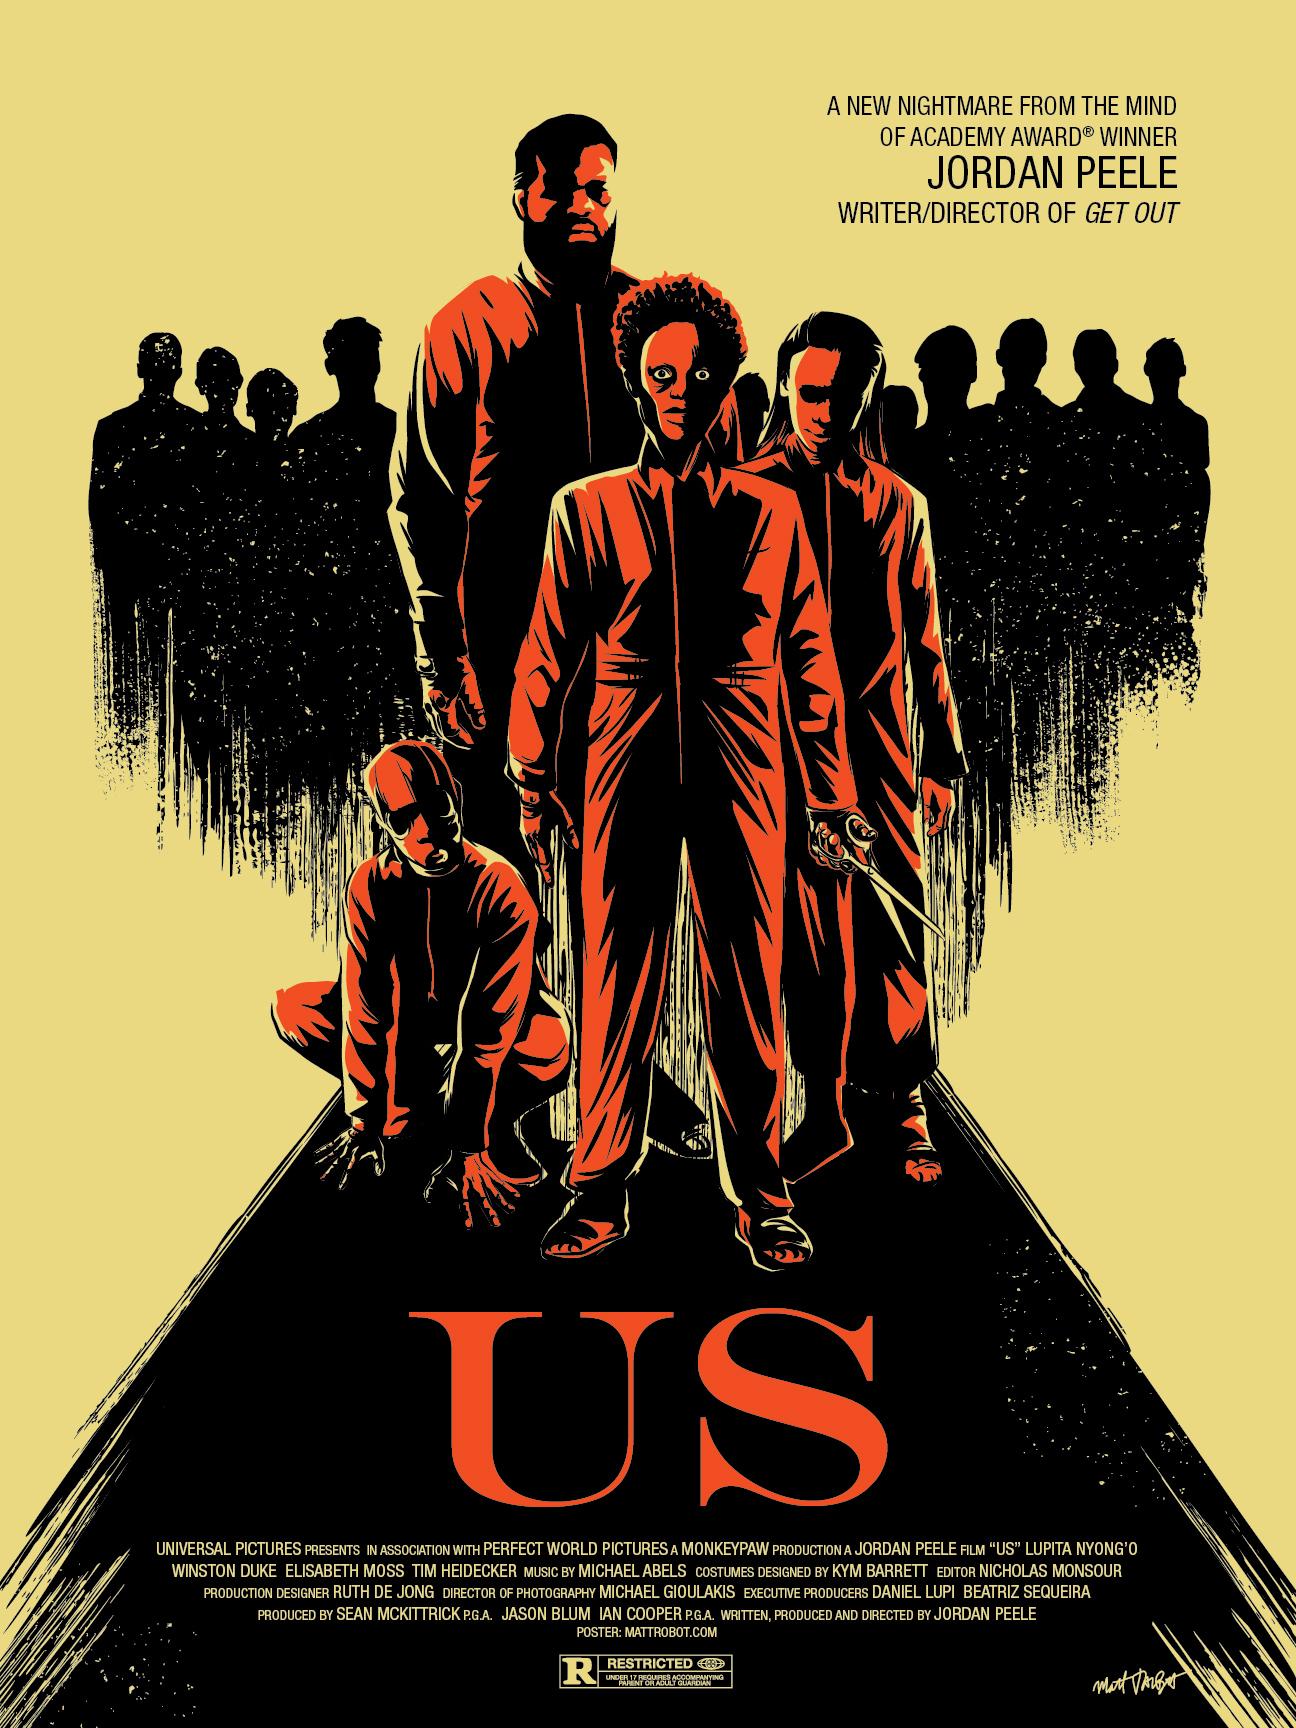 Jordan Peele's Us poster by Matt Talbot